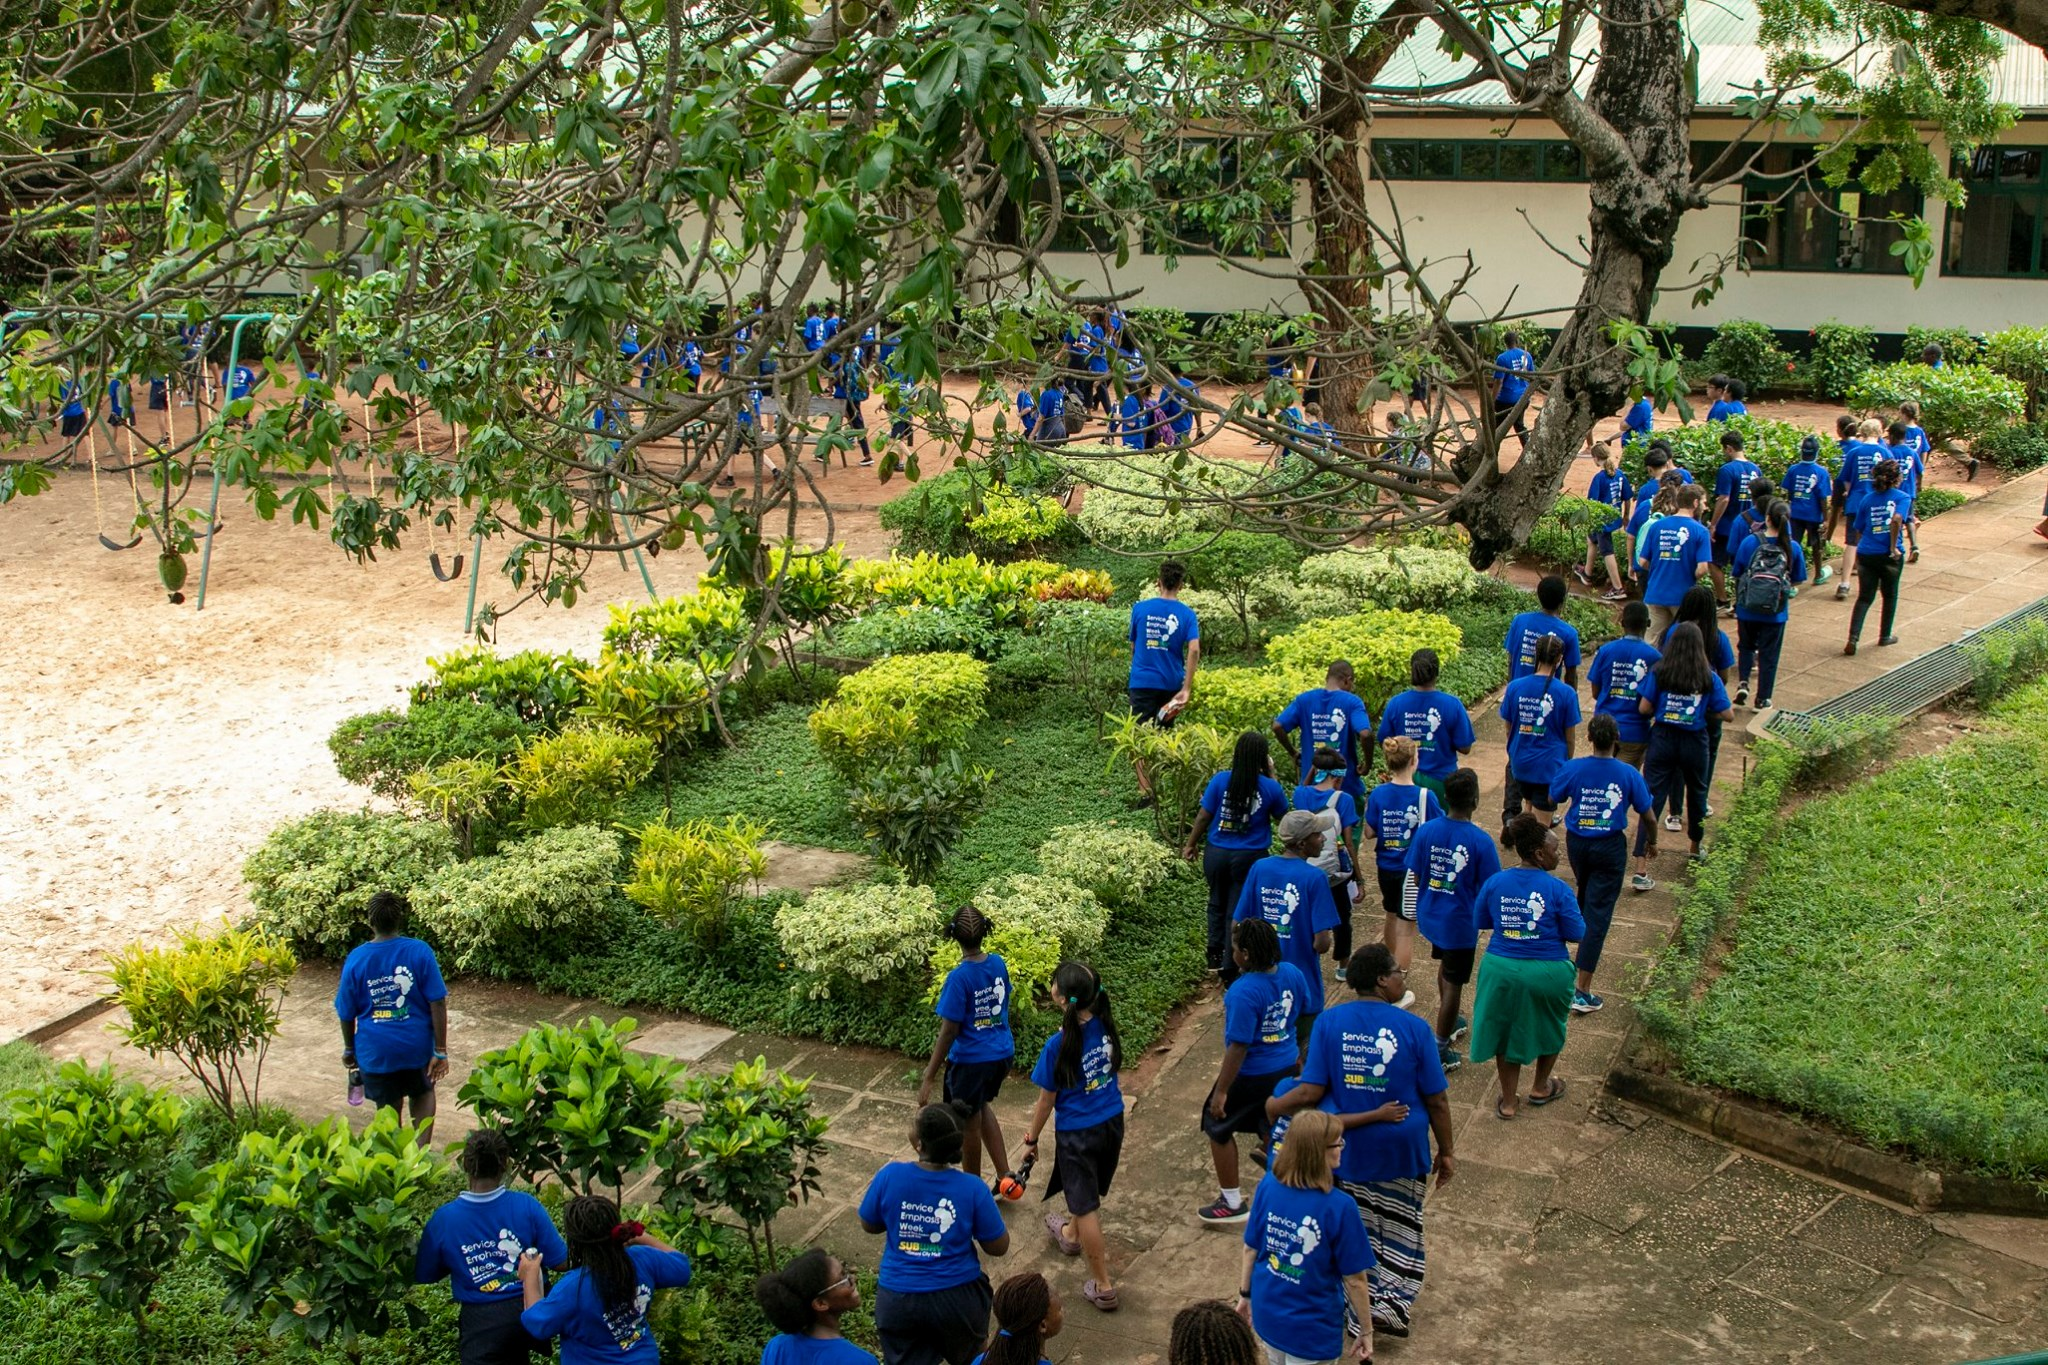 Christians help restart education worldwide